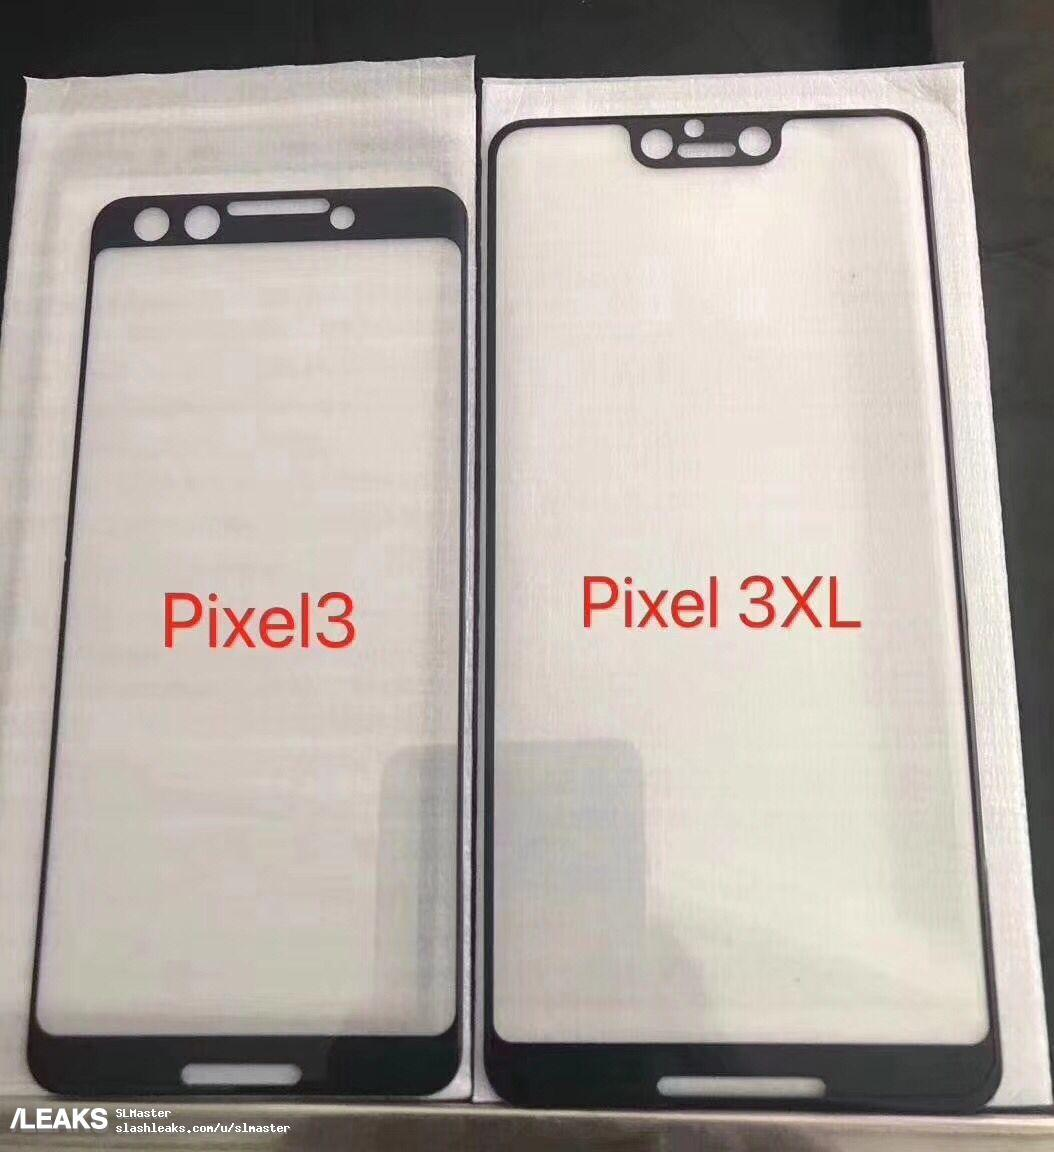 pixel 3 med notch i toppen